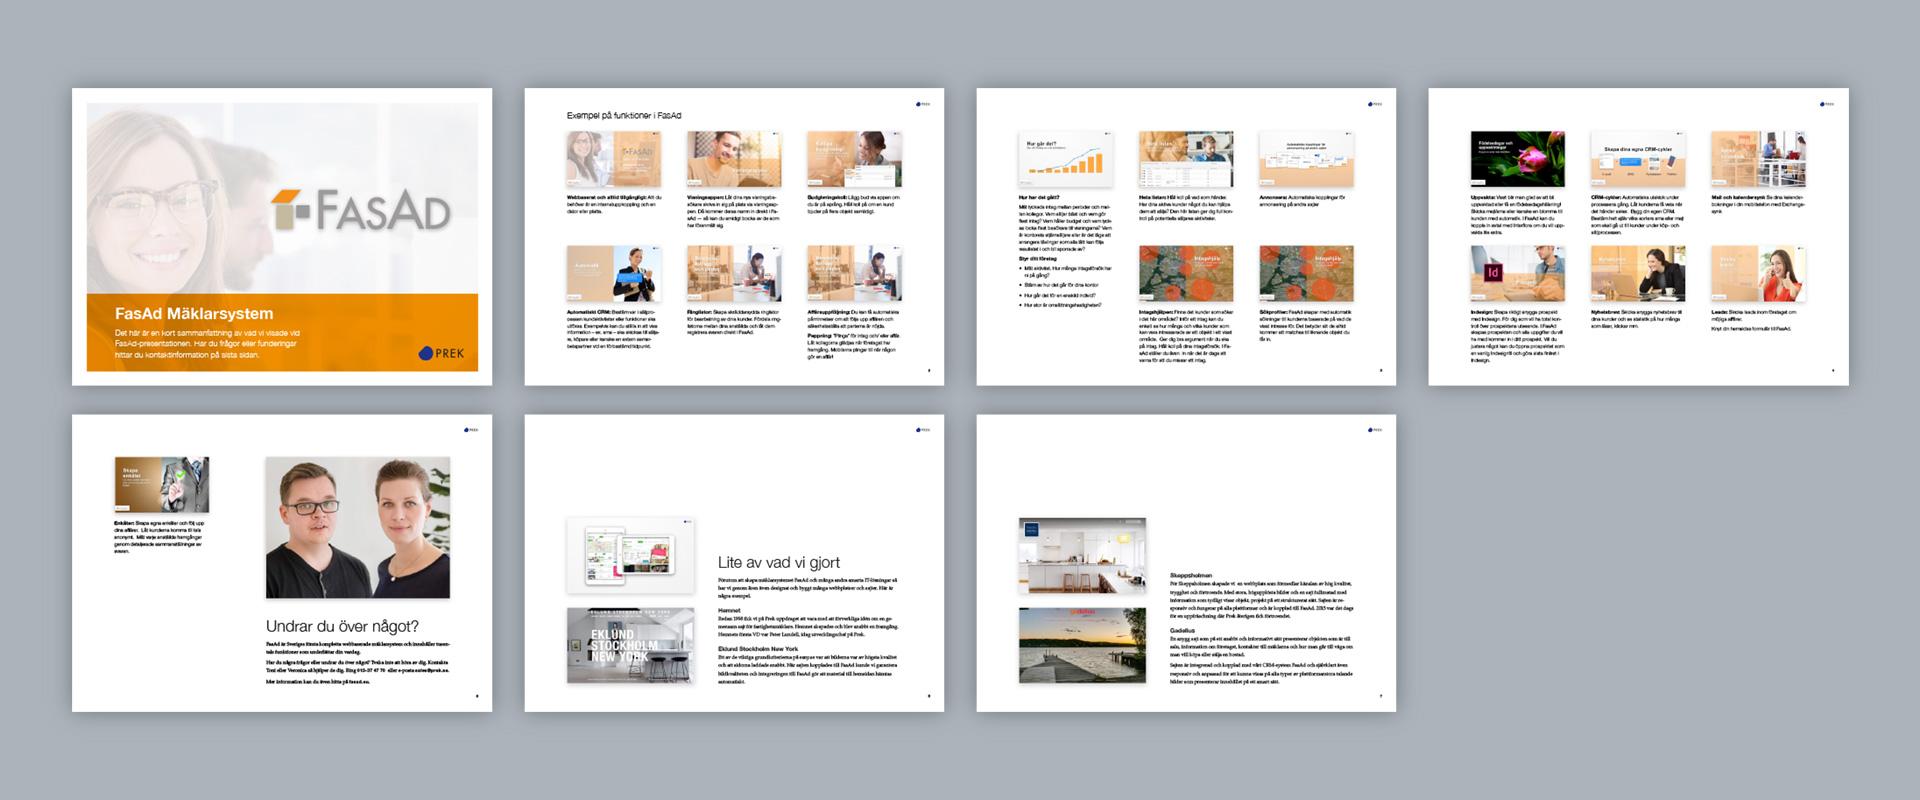 Presentation av en presentation |©Janne A